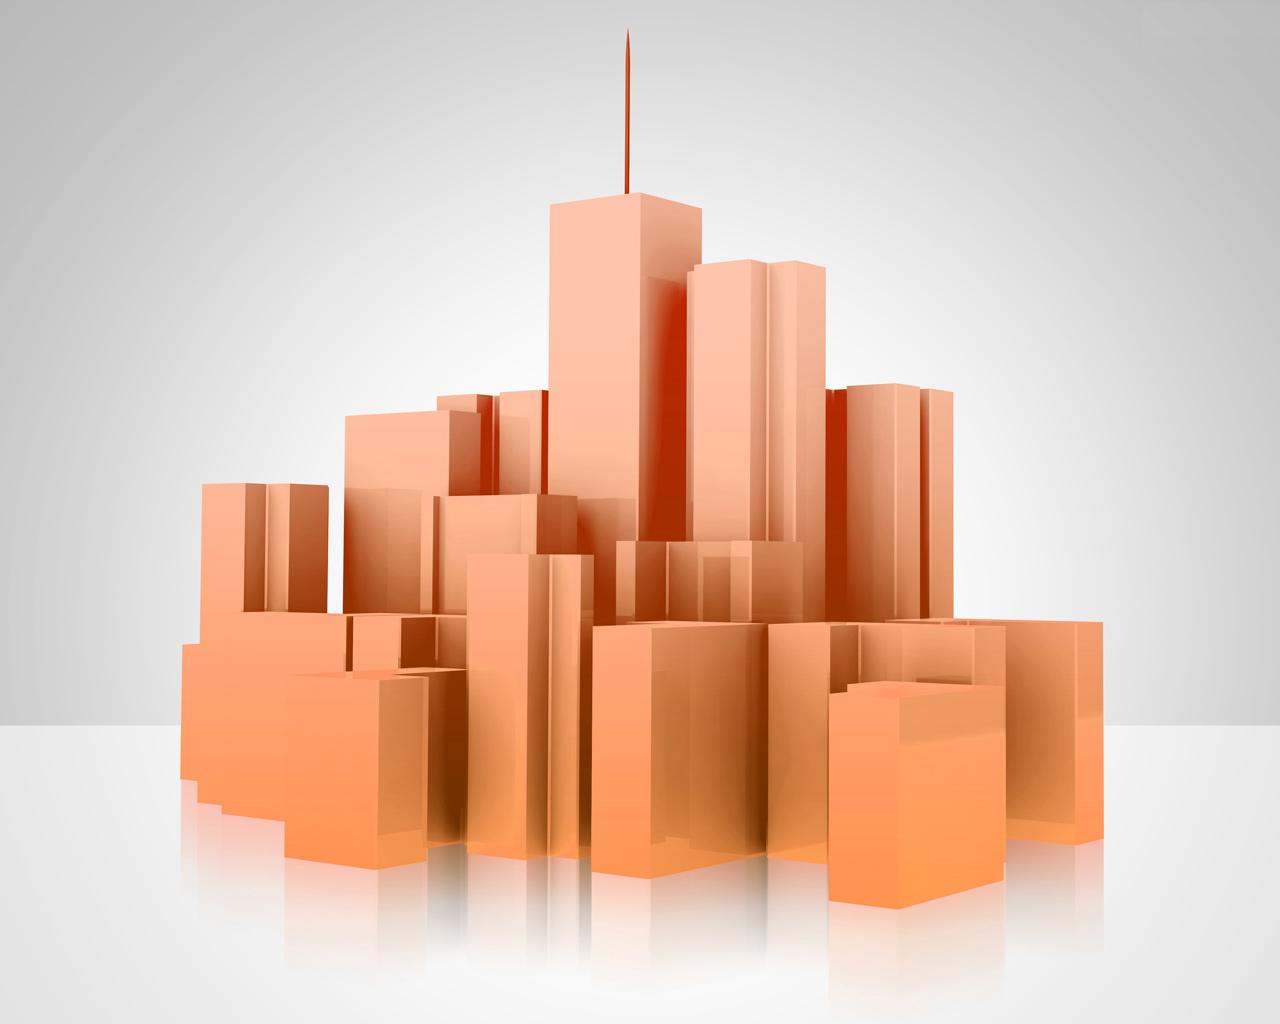 3D City Model PPT Backgrounds